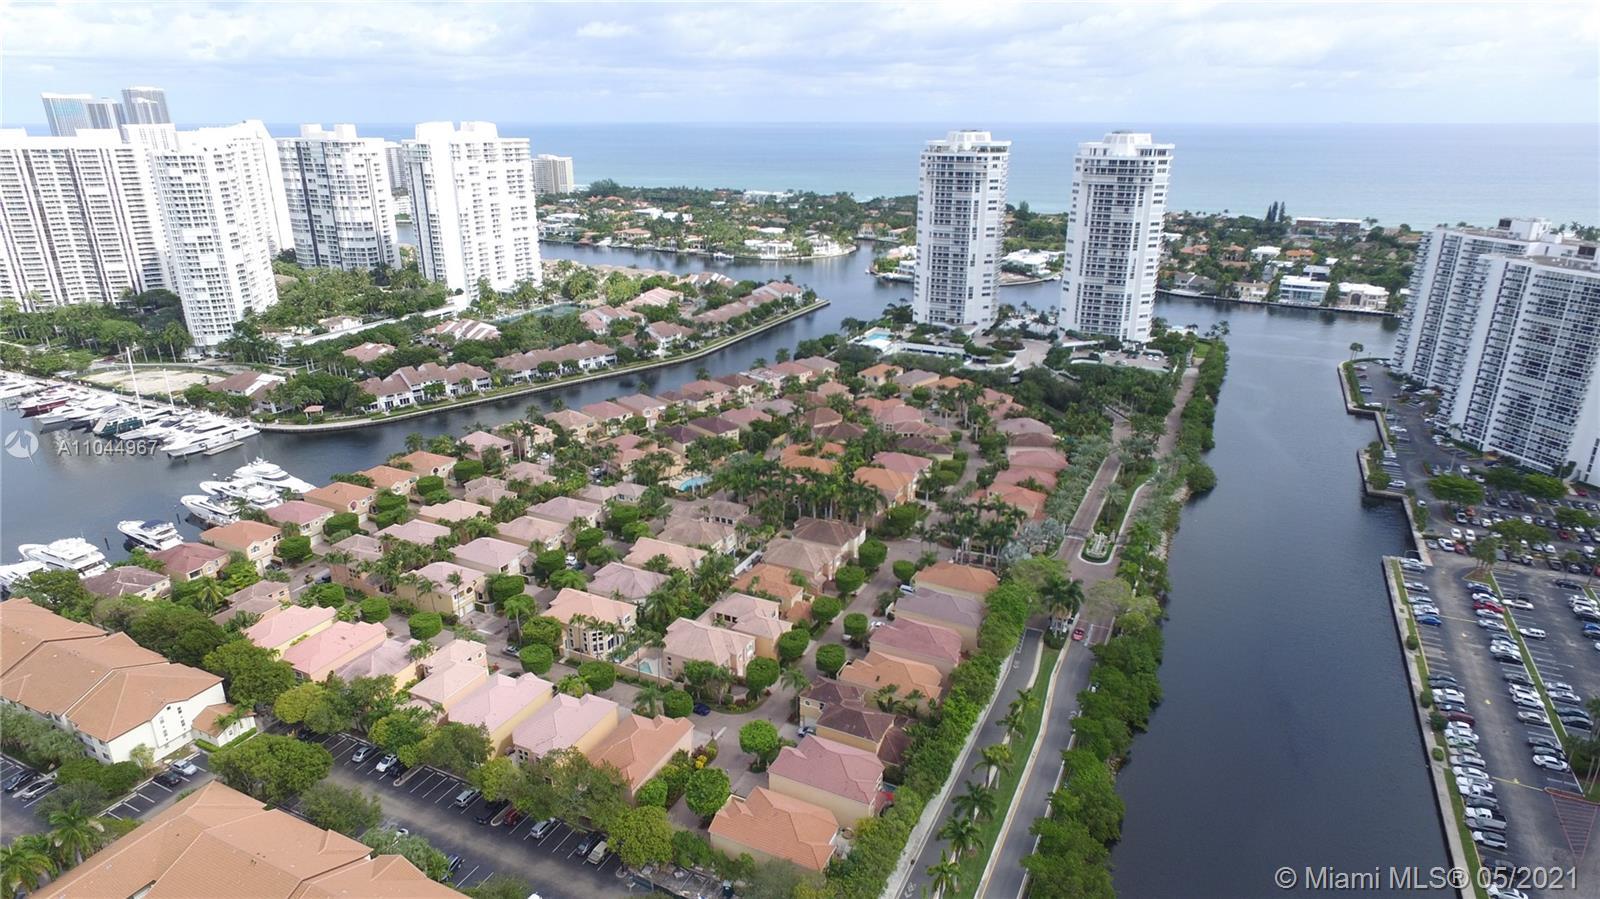 Photo of 3708 207 Terr, Aventura, Florida, 33180 -